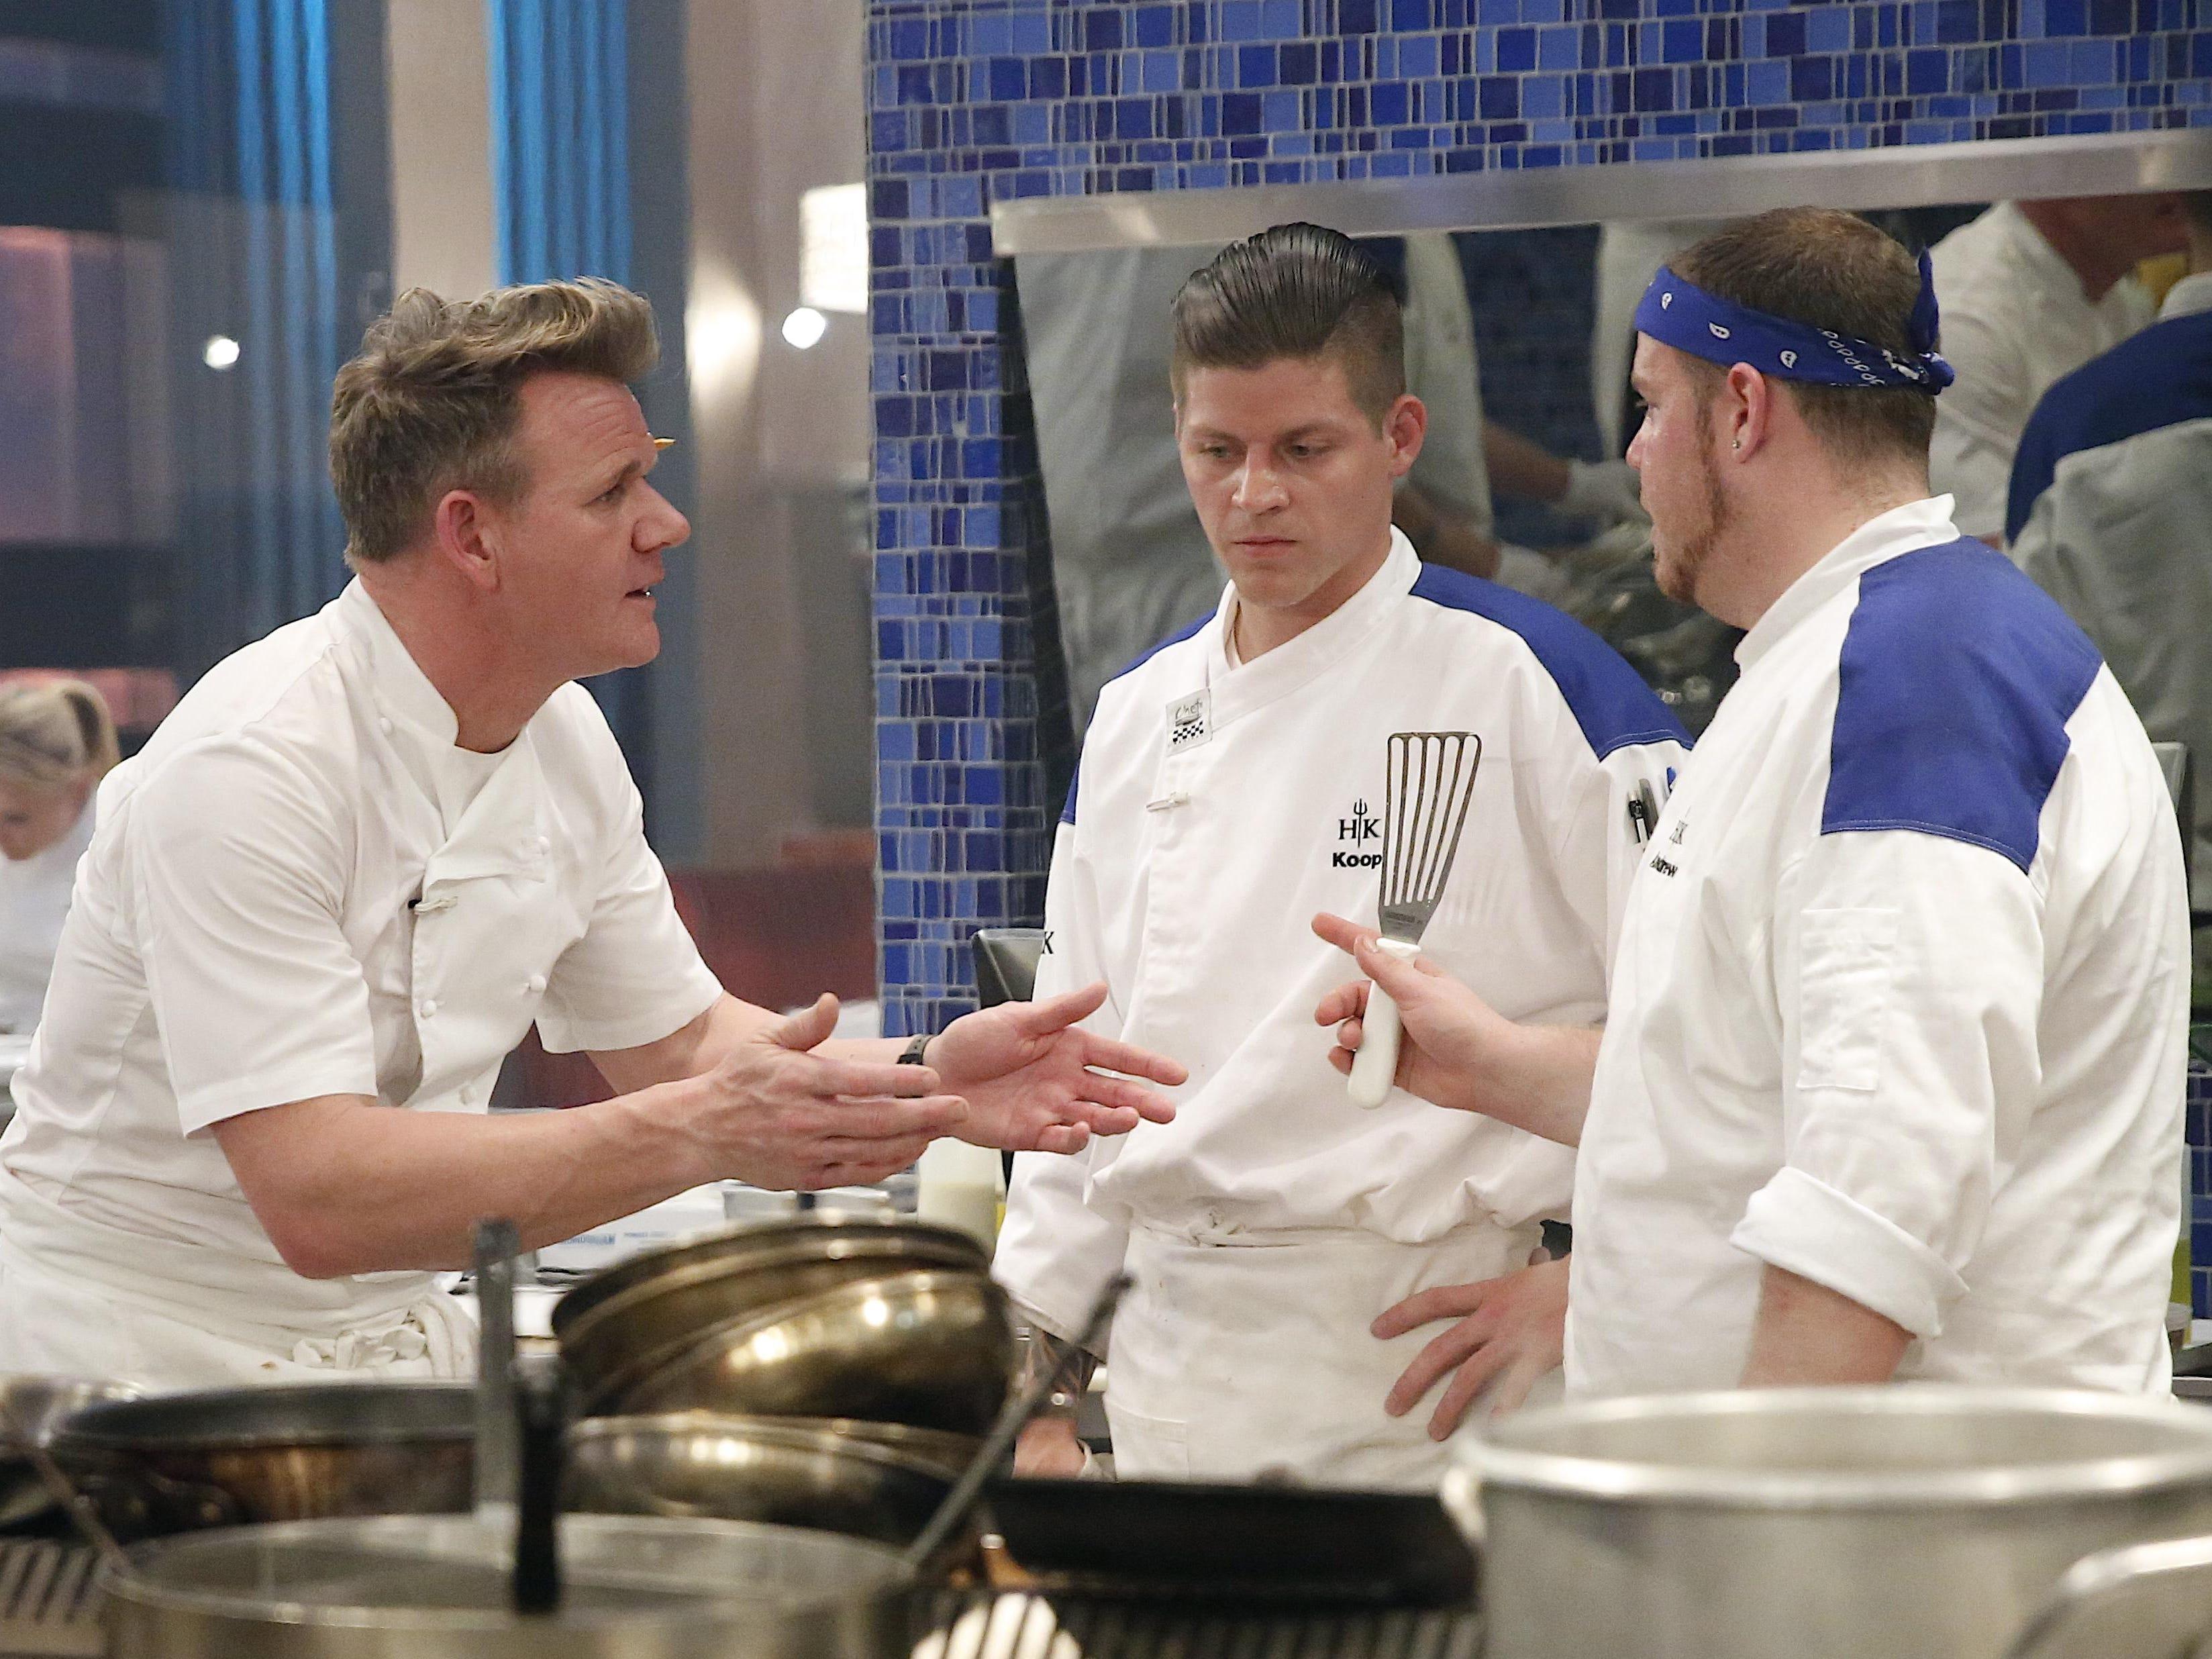 hell s kitchen season 16 episode 8 - Hells Kitchen Season 16 Episode 1